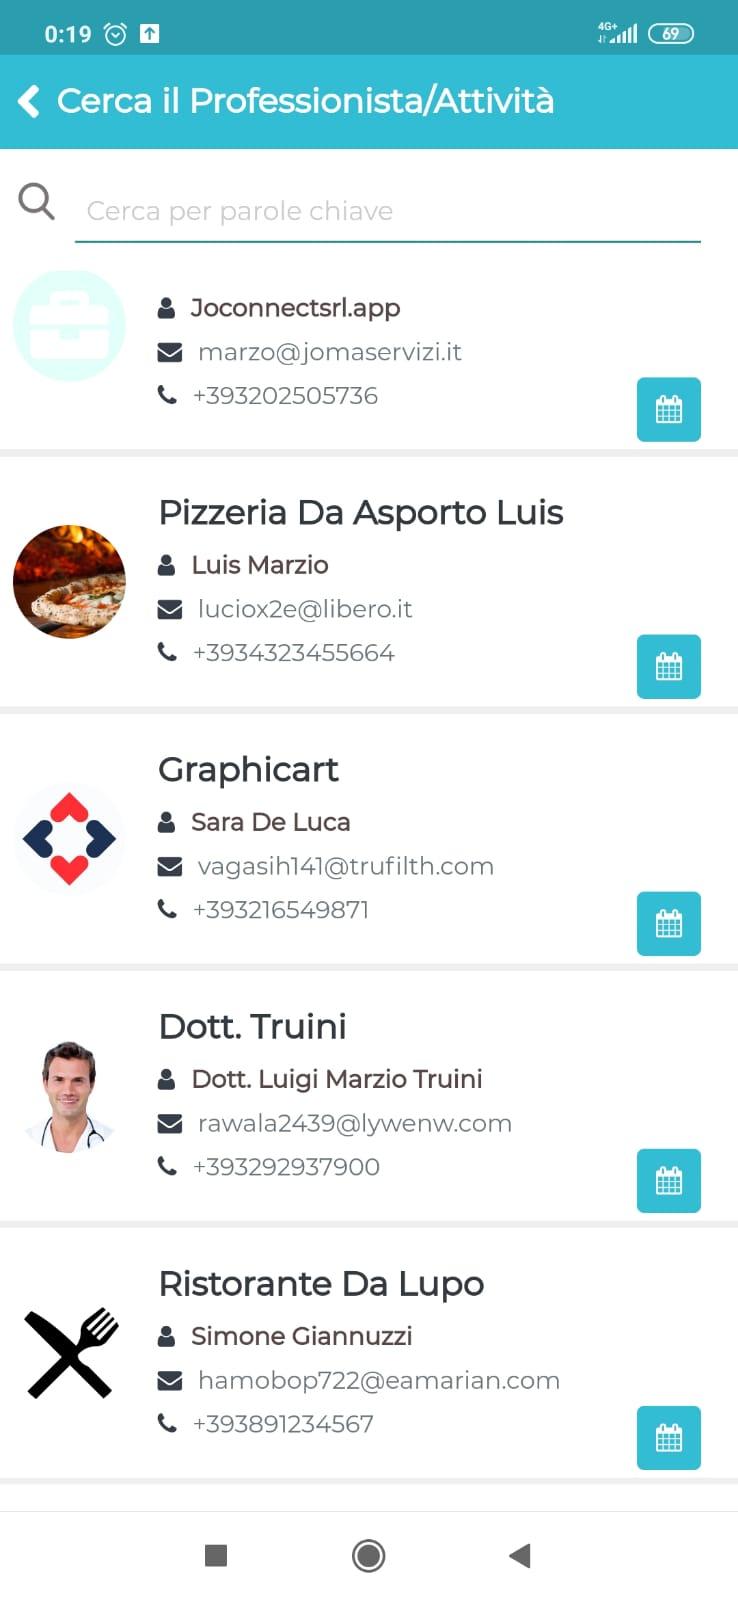 screenshot-5_elenco_professionisti